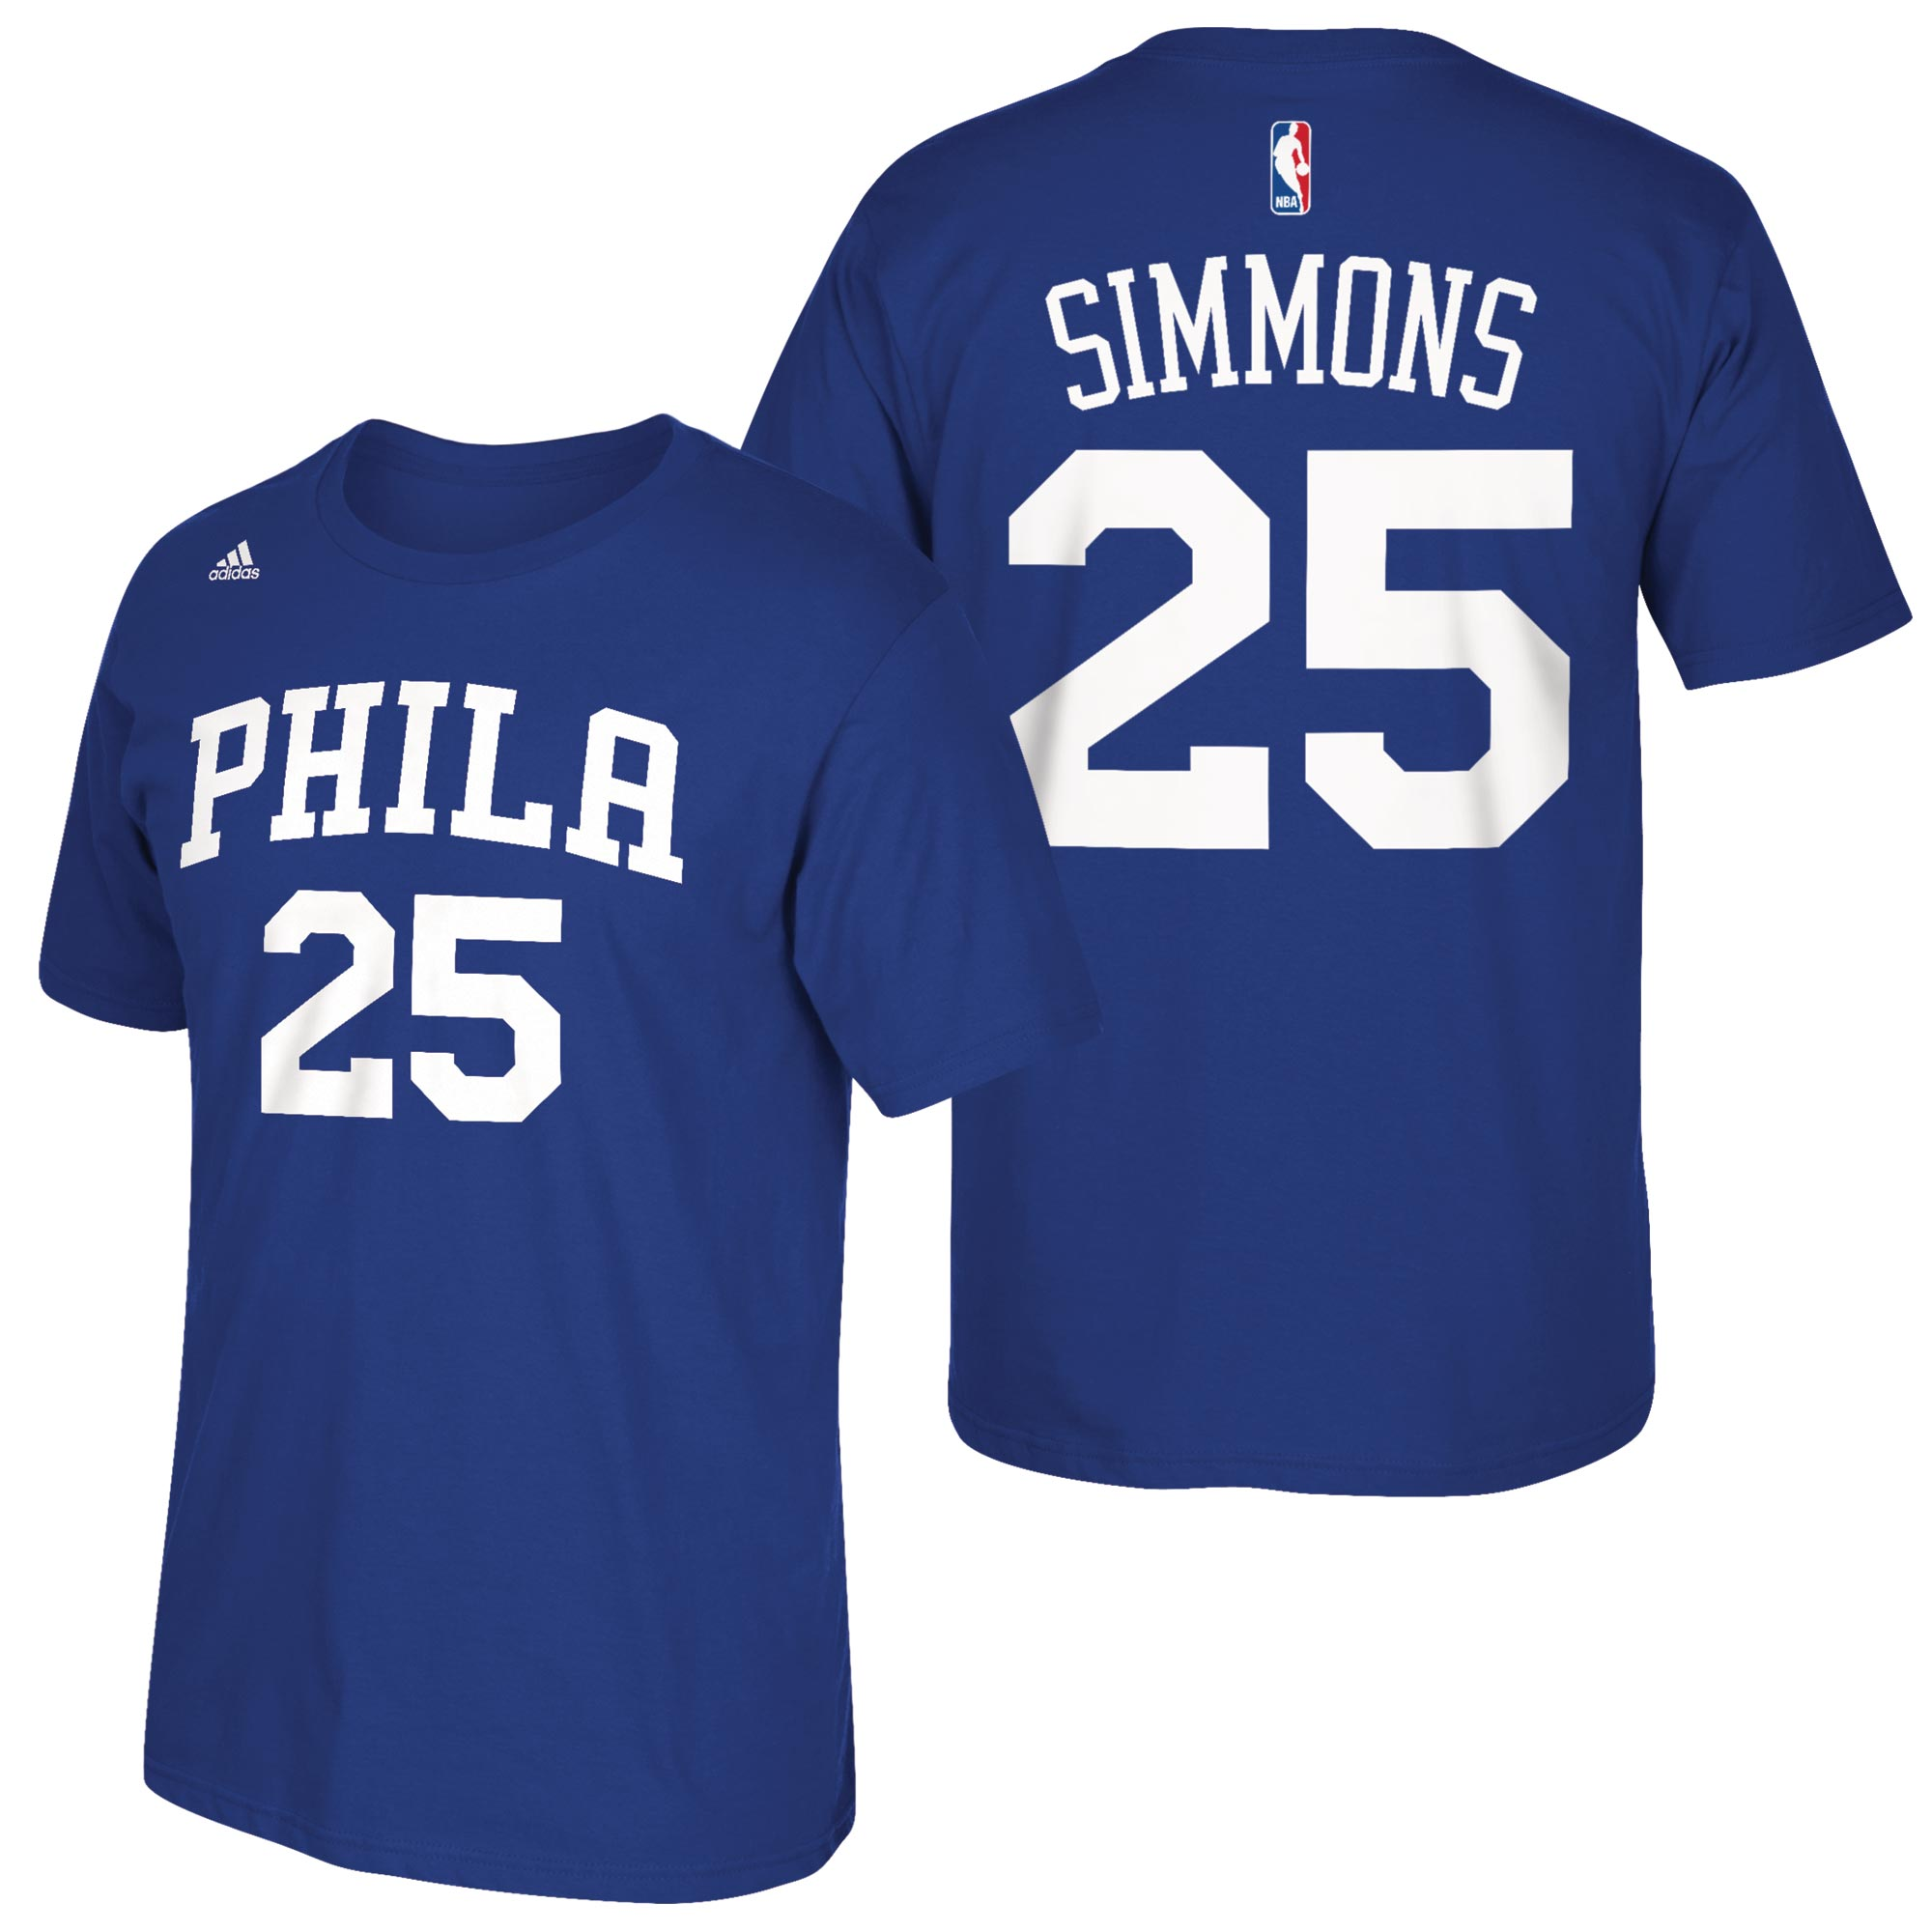 Philadelphia 76ers adidas Name & Number T-Shirt - Ben Simmons - Mens